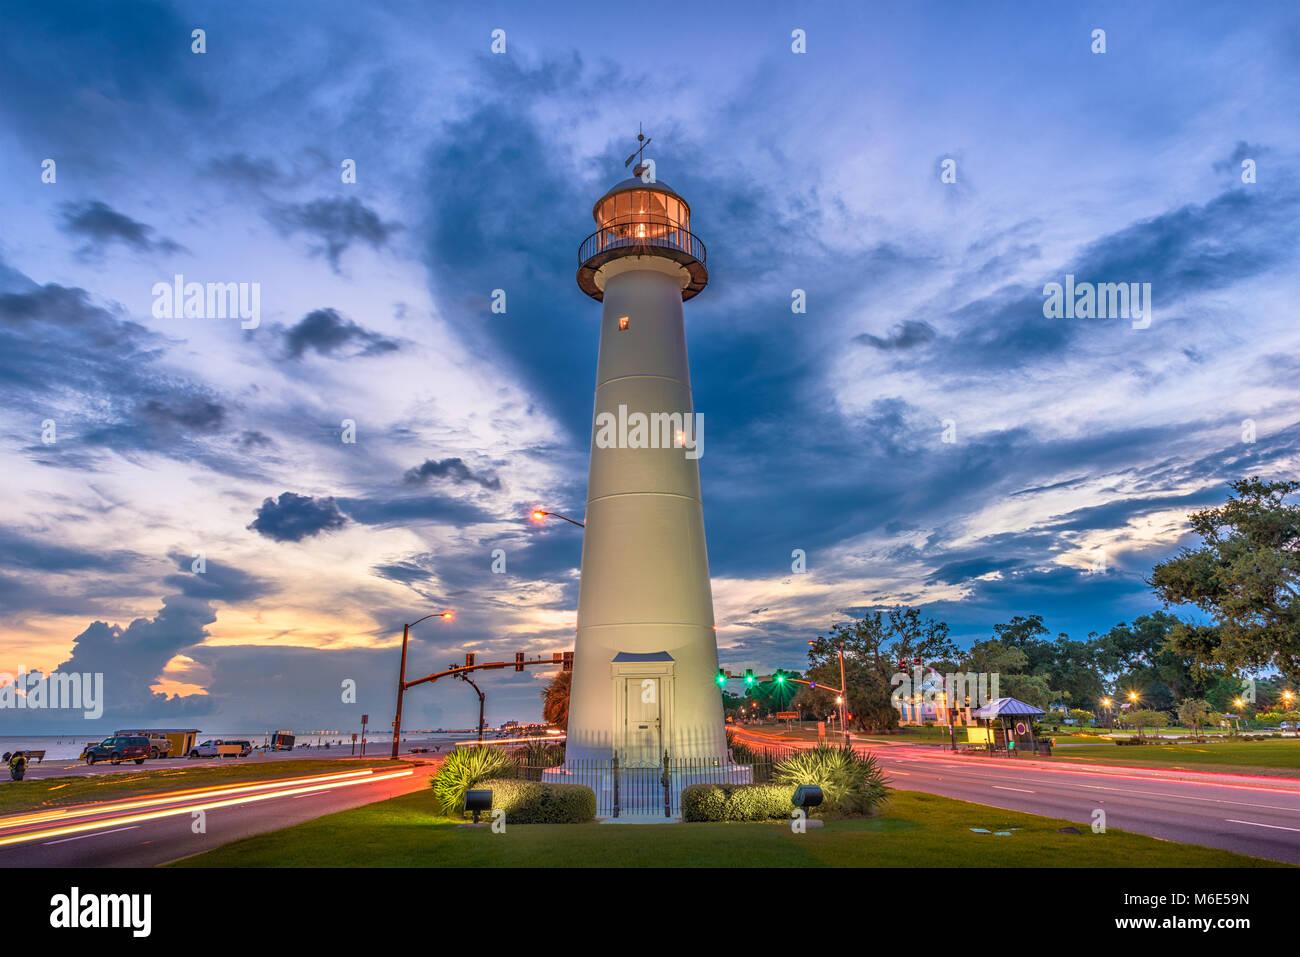 Biloxi, Mississippi, USA Leuchtturm in der Dämmerung. Stockbild